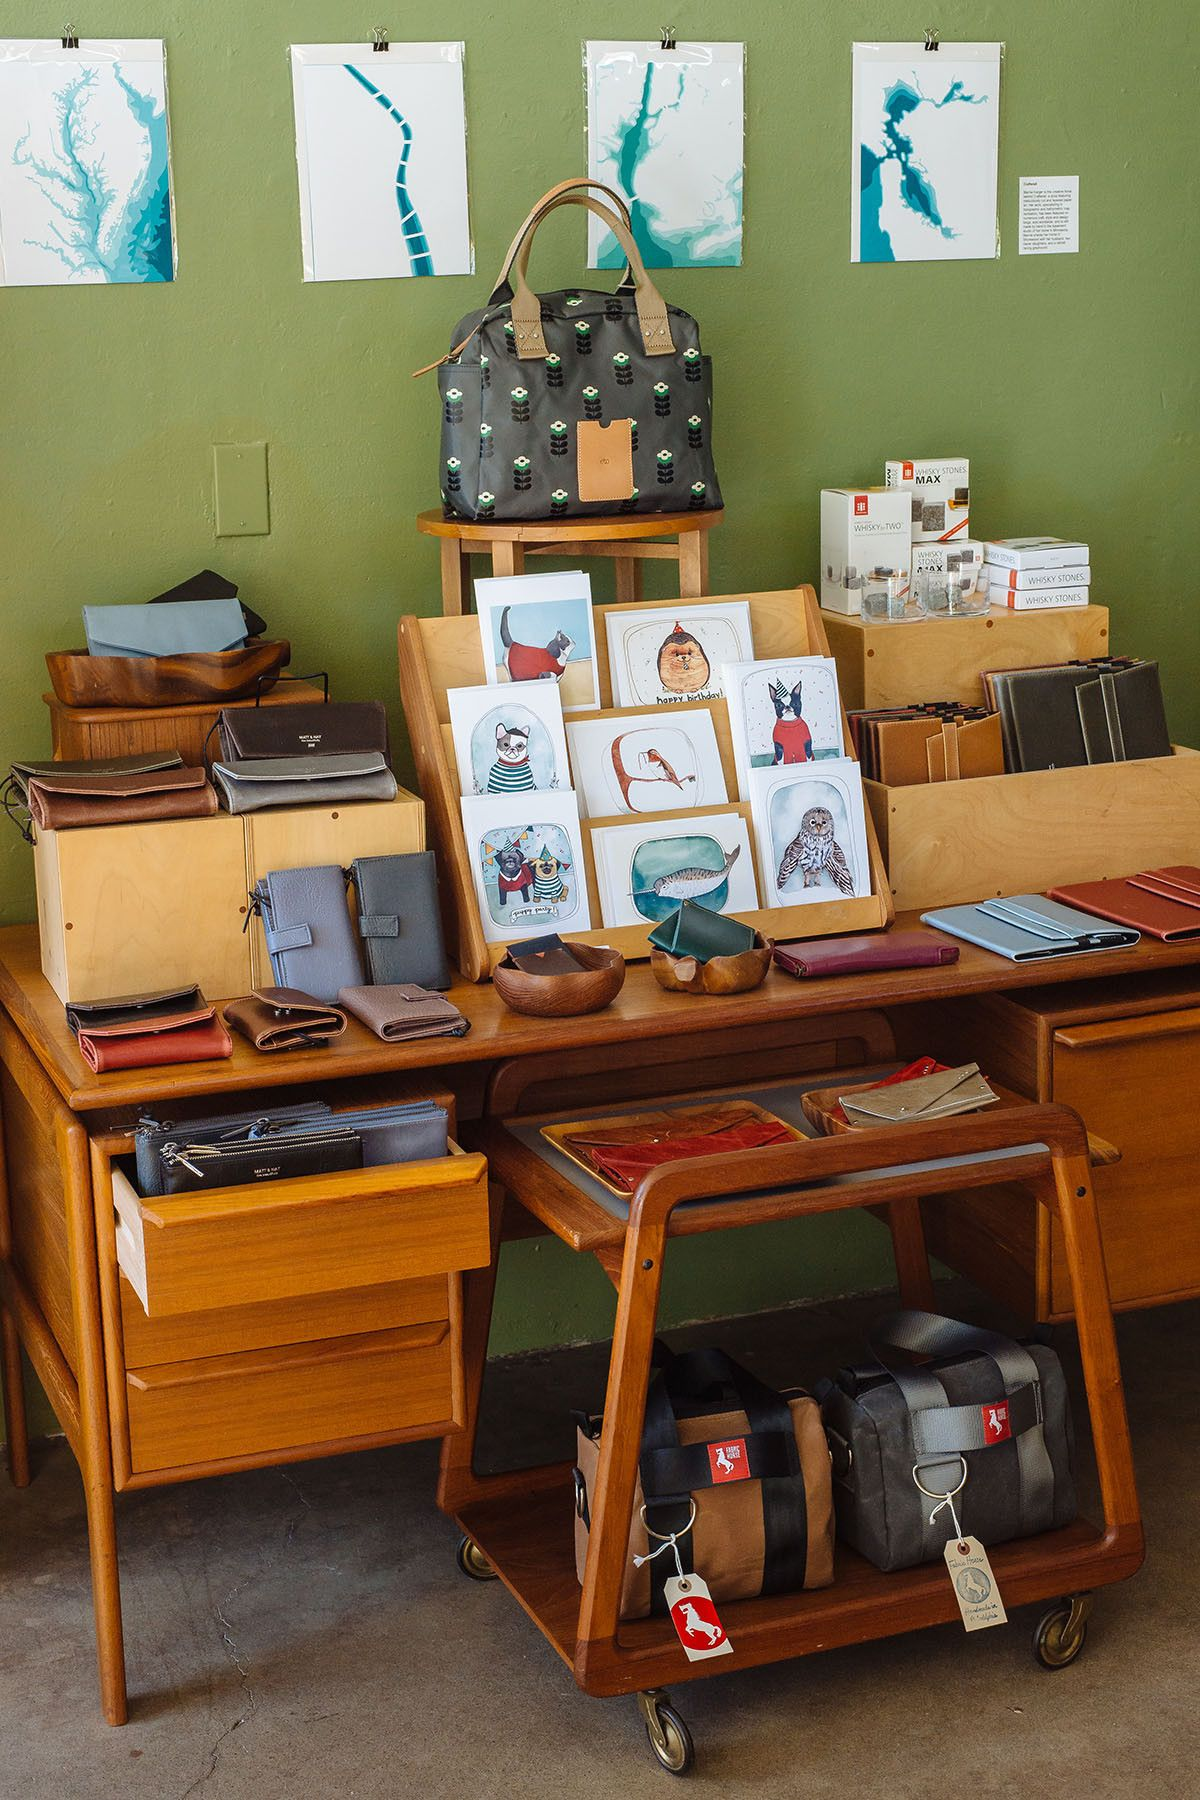 Kangaloop Tilde Travel usa, Home decor, Decor